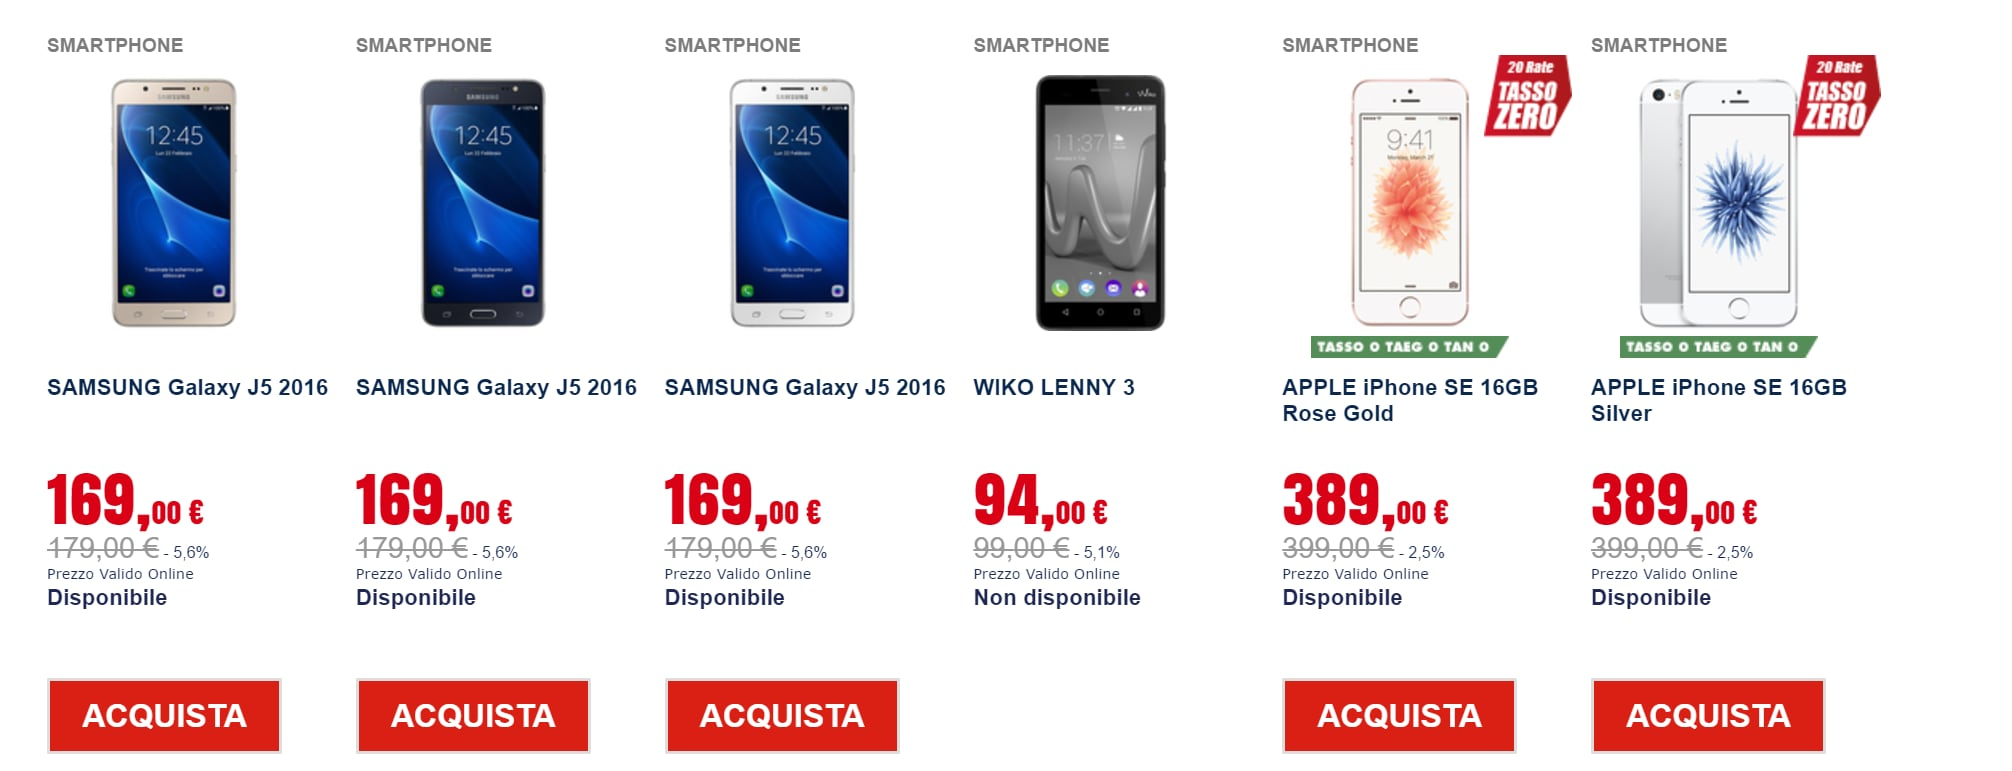 offerte trony happy price maggio 2017_smartphone (3)